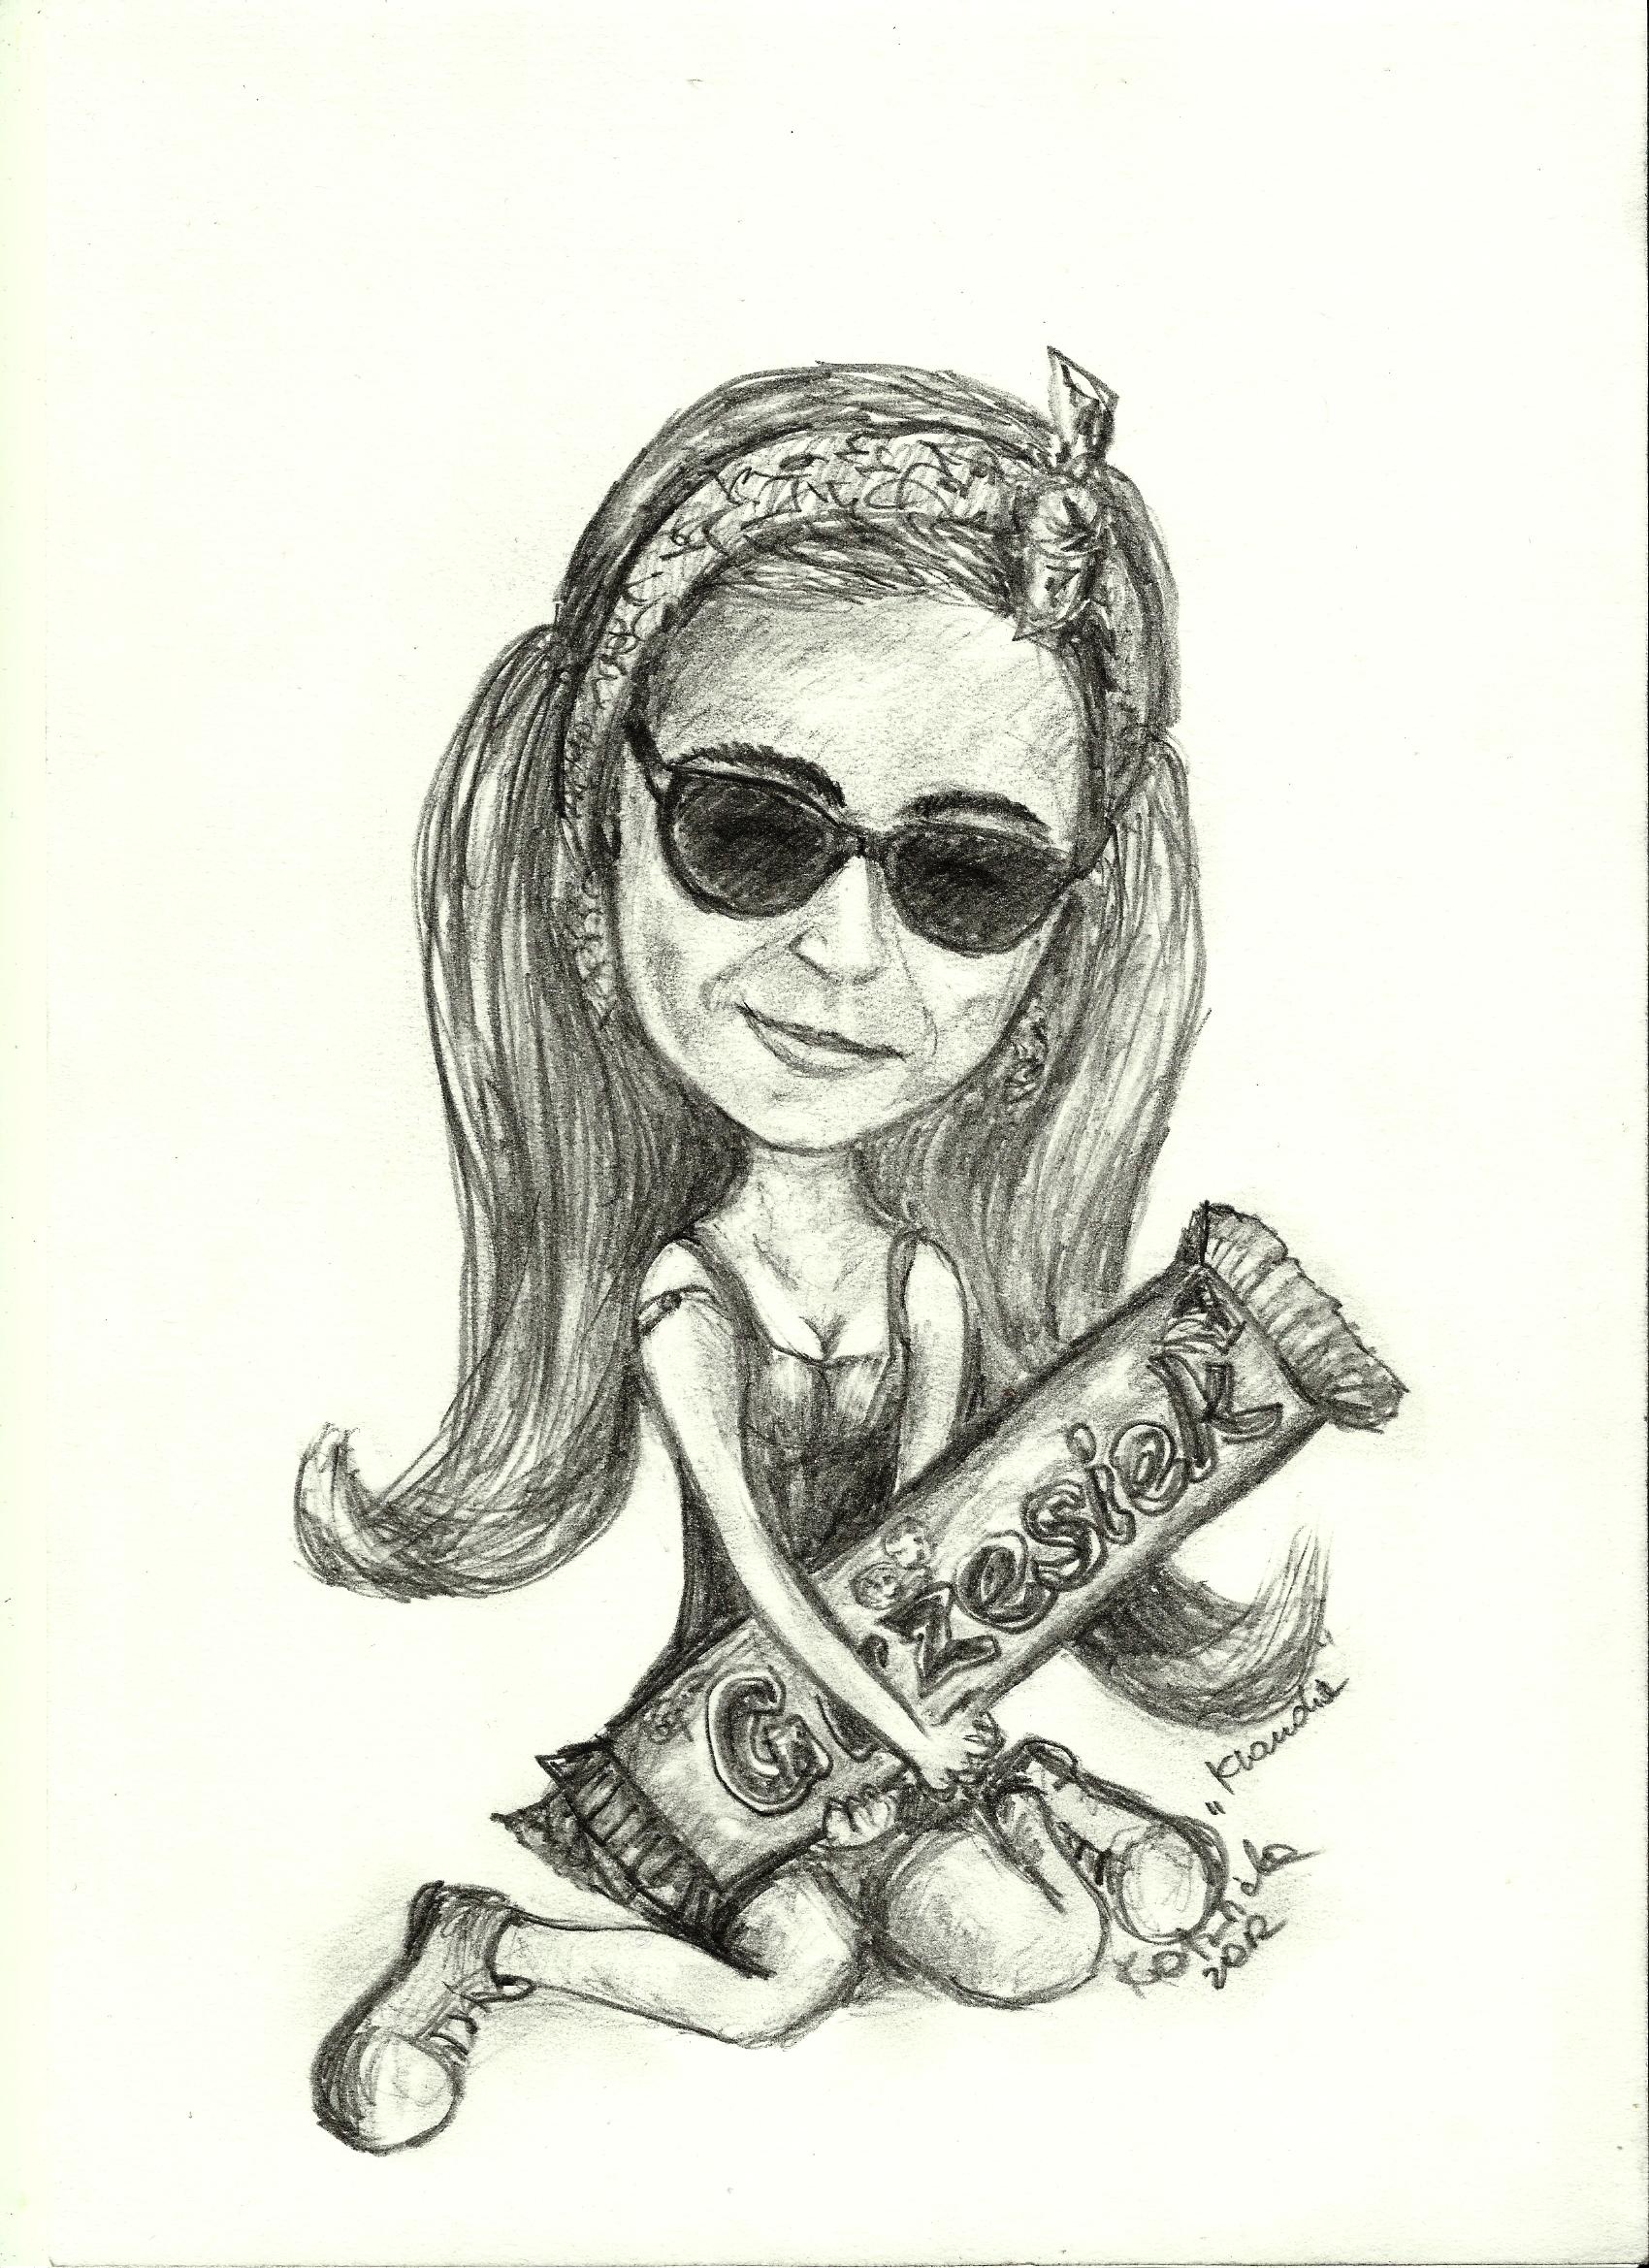 Klaudia's caricature by Kotwinka